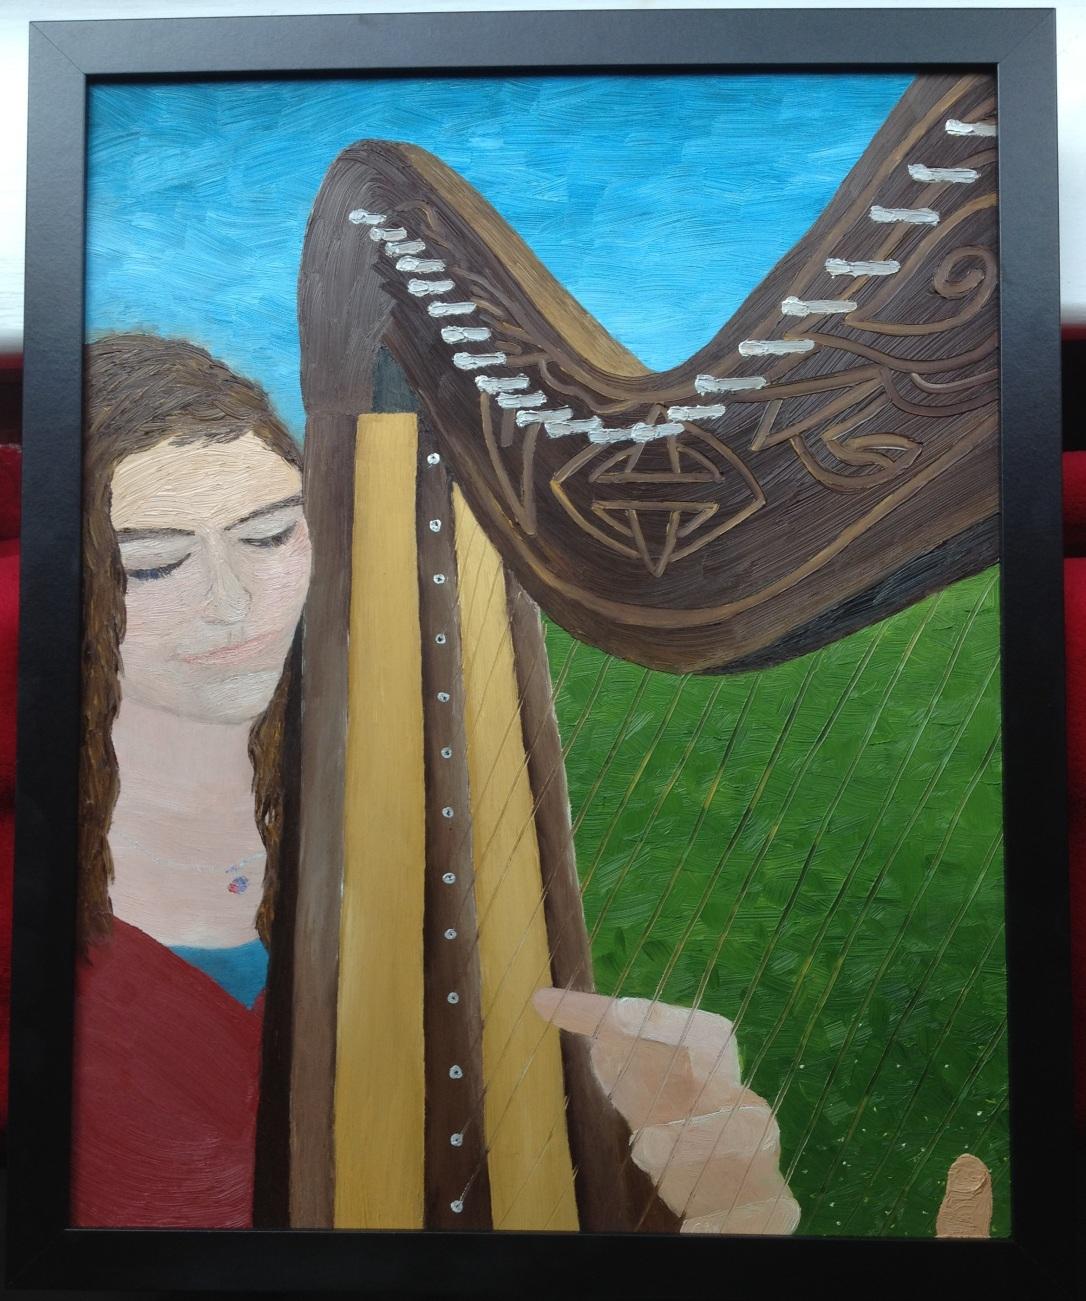 70-harp-player-oil-on-wooden-board-framed-1-2